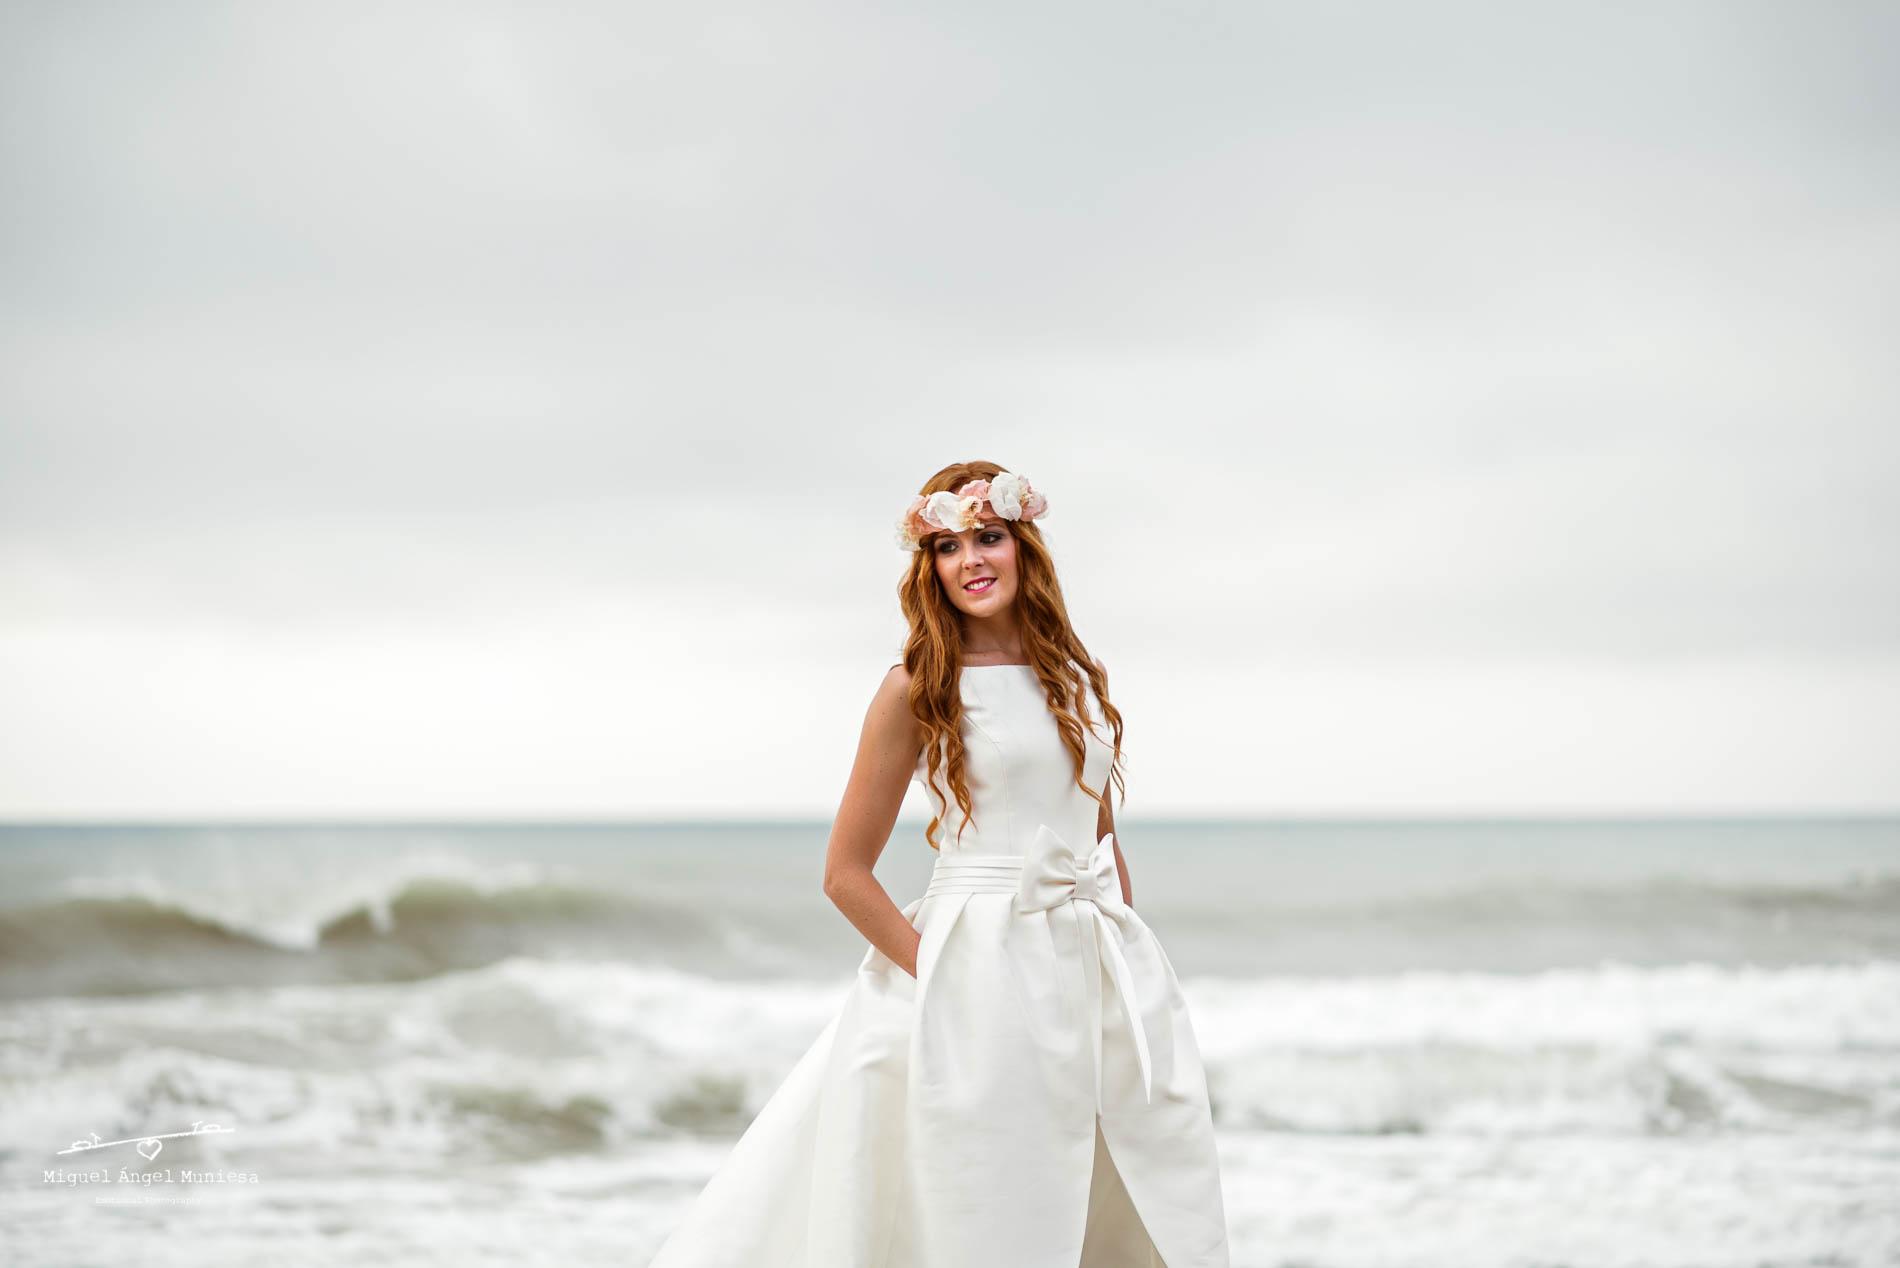 boda, fotografia de boda, boda zaragoza, fotografia, wedding, wedding photography, miguel angel muniesa, fotografo boda Zaragoza, fotografo boda, destination wedding_ 0003